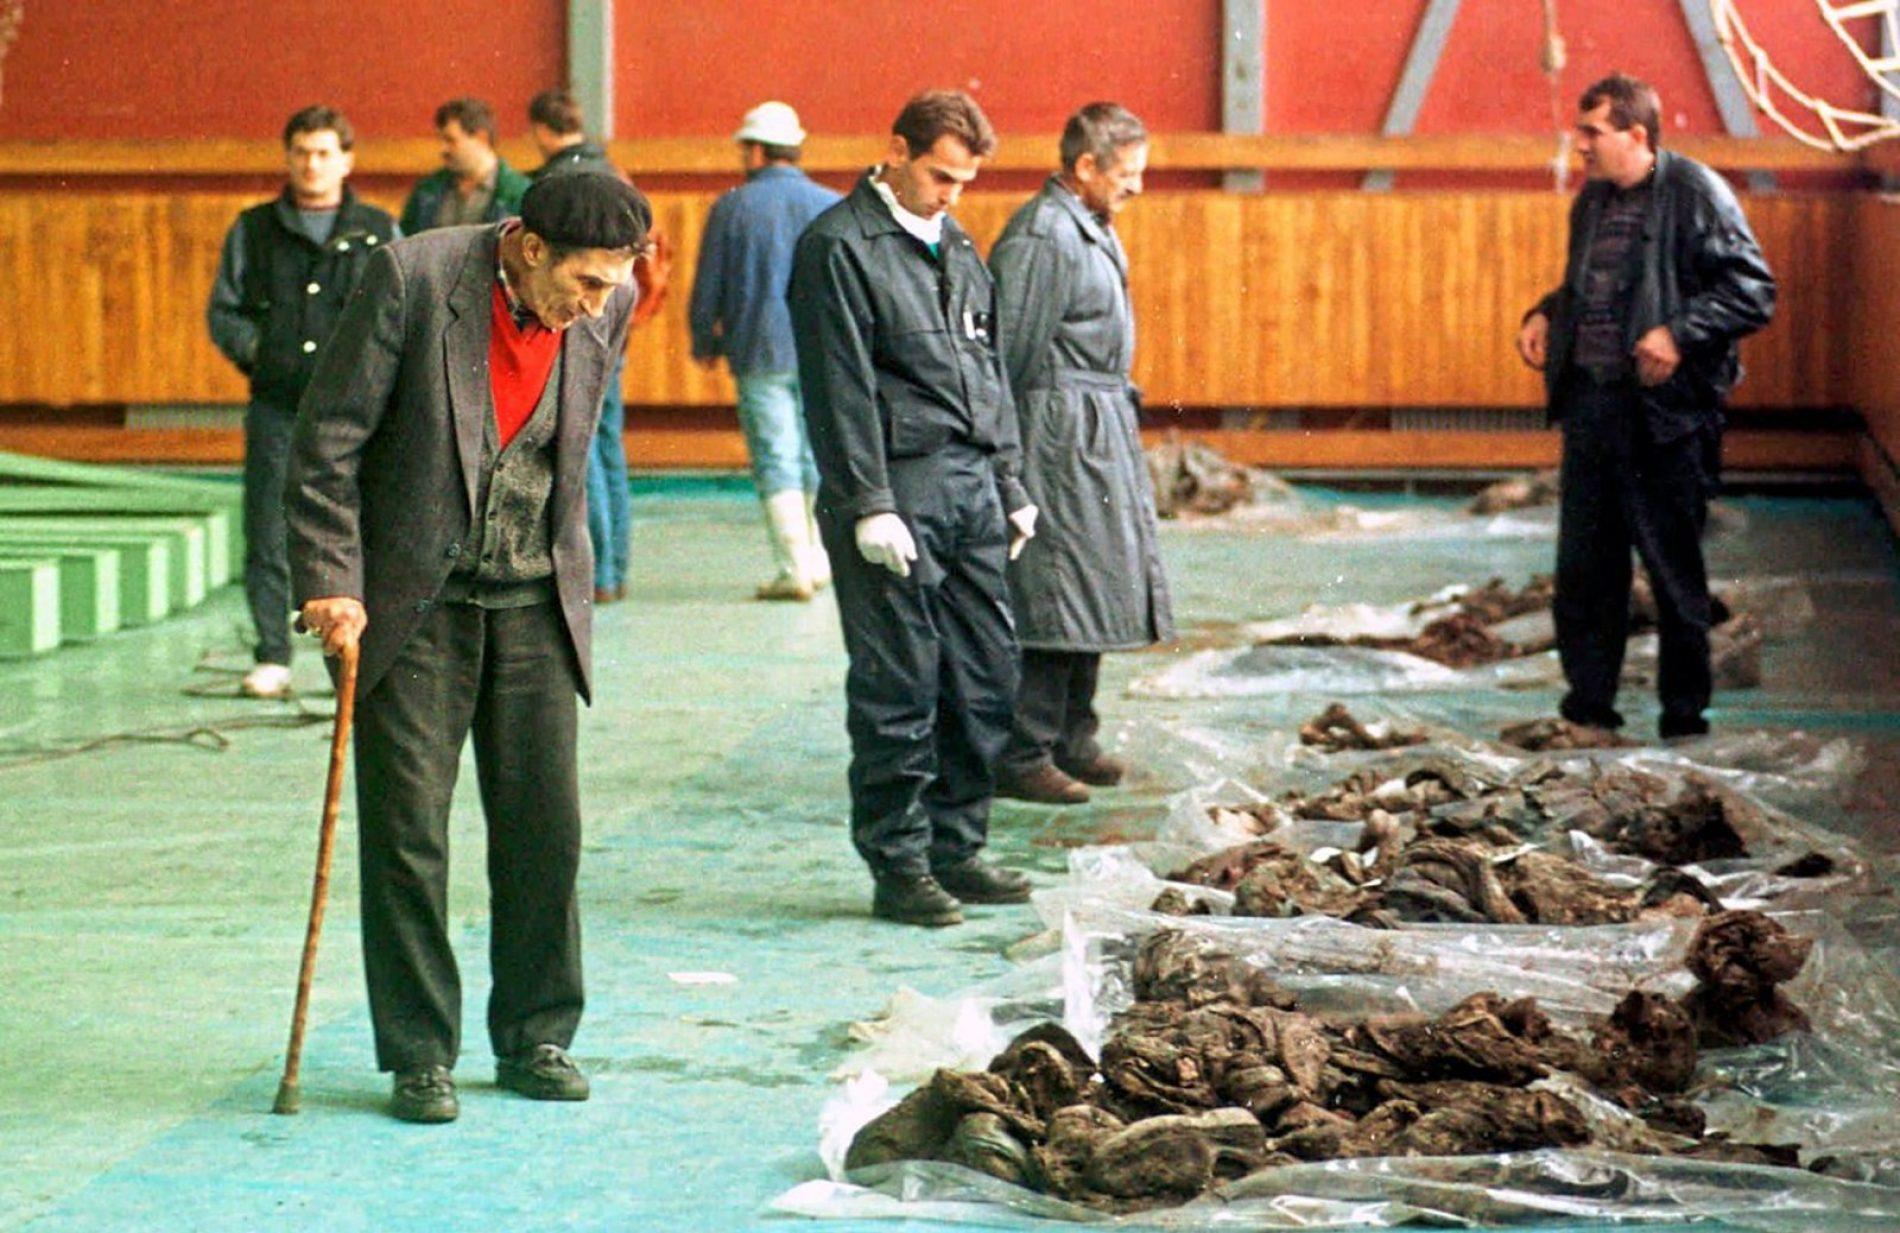 Austrijski list o skretanju pogleda Evropljana, iako se nastavlja agresija na Bosnu